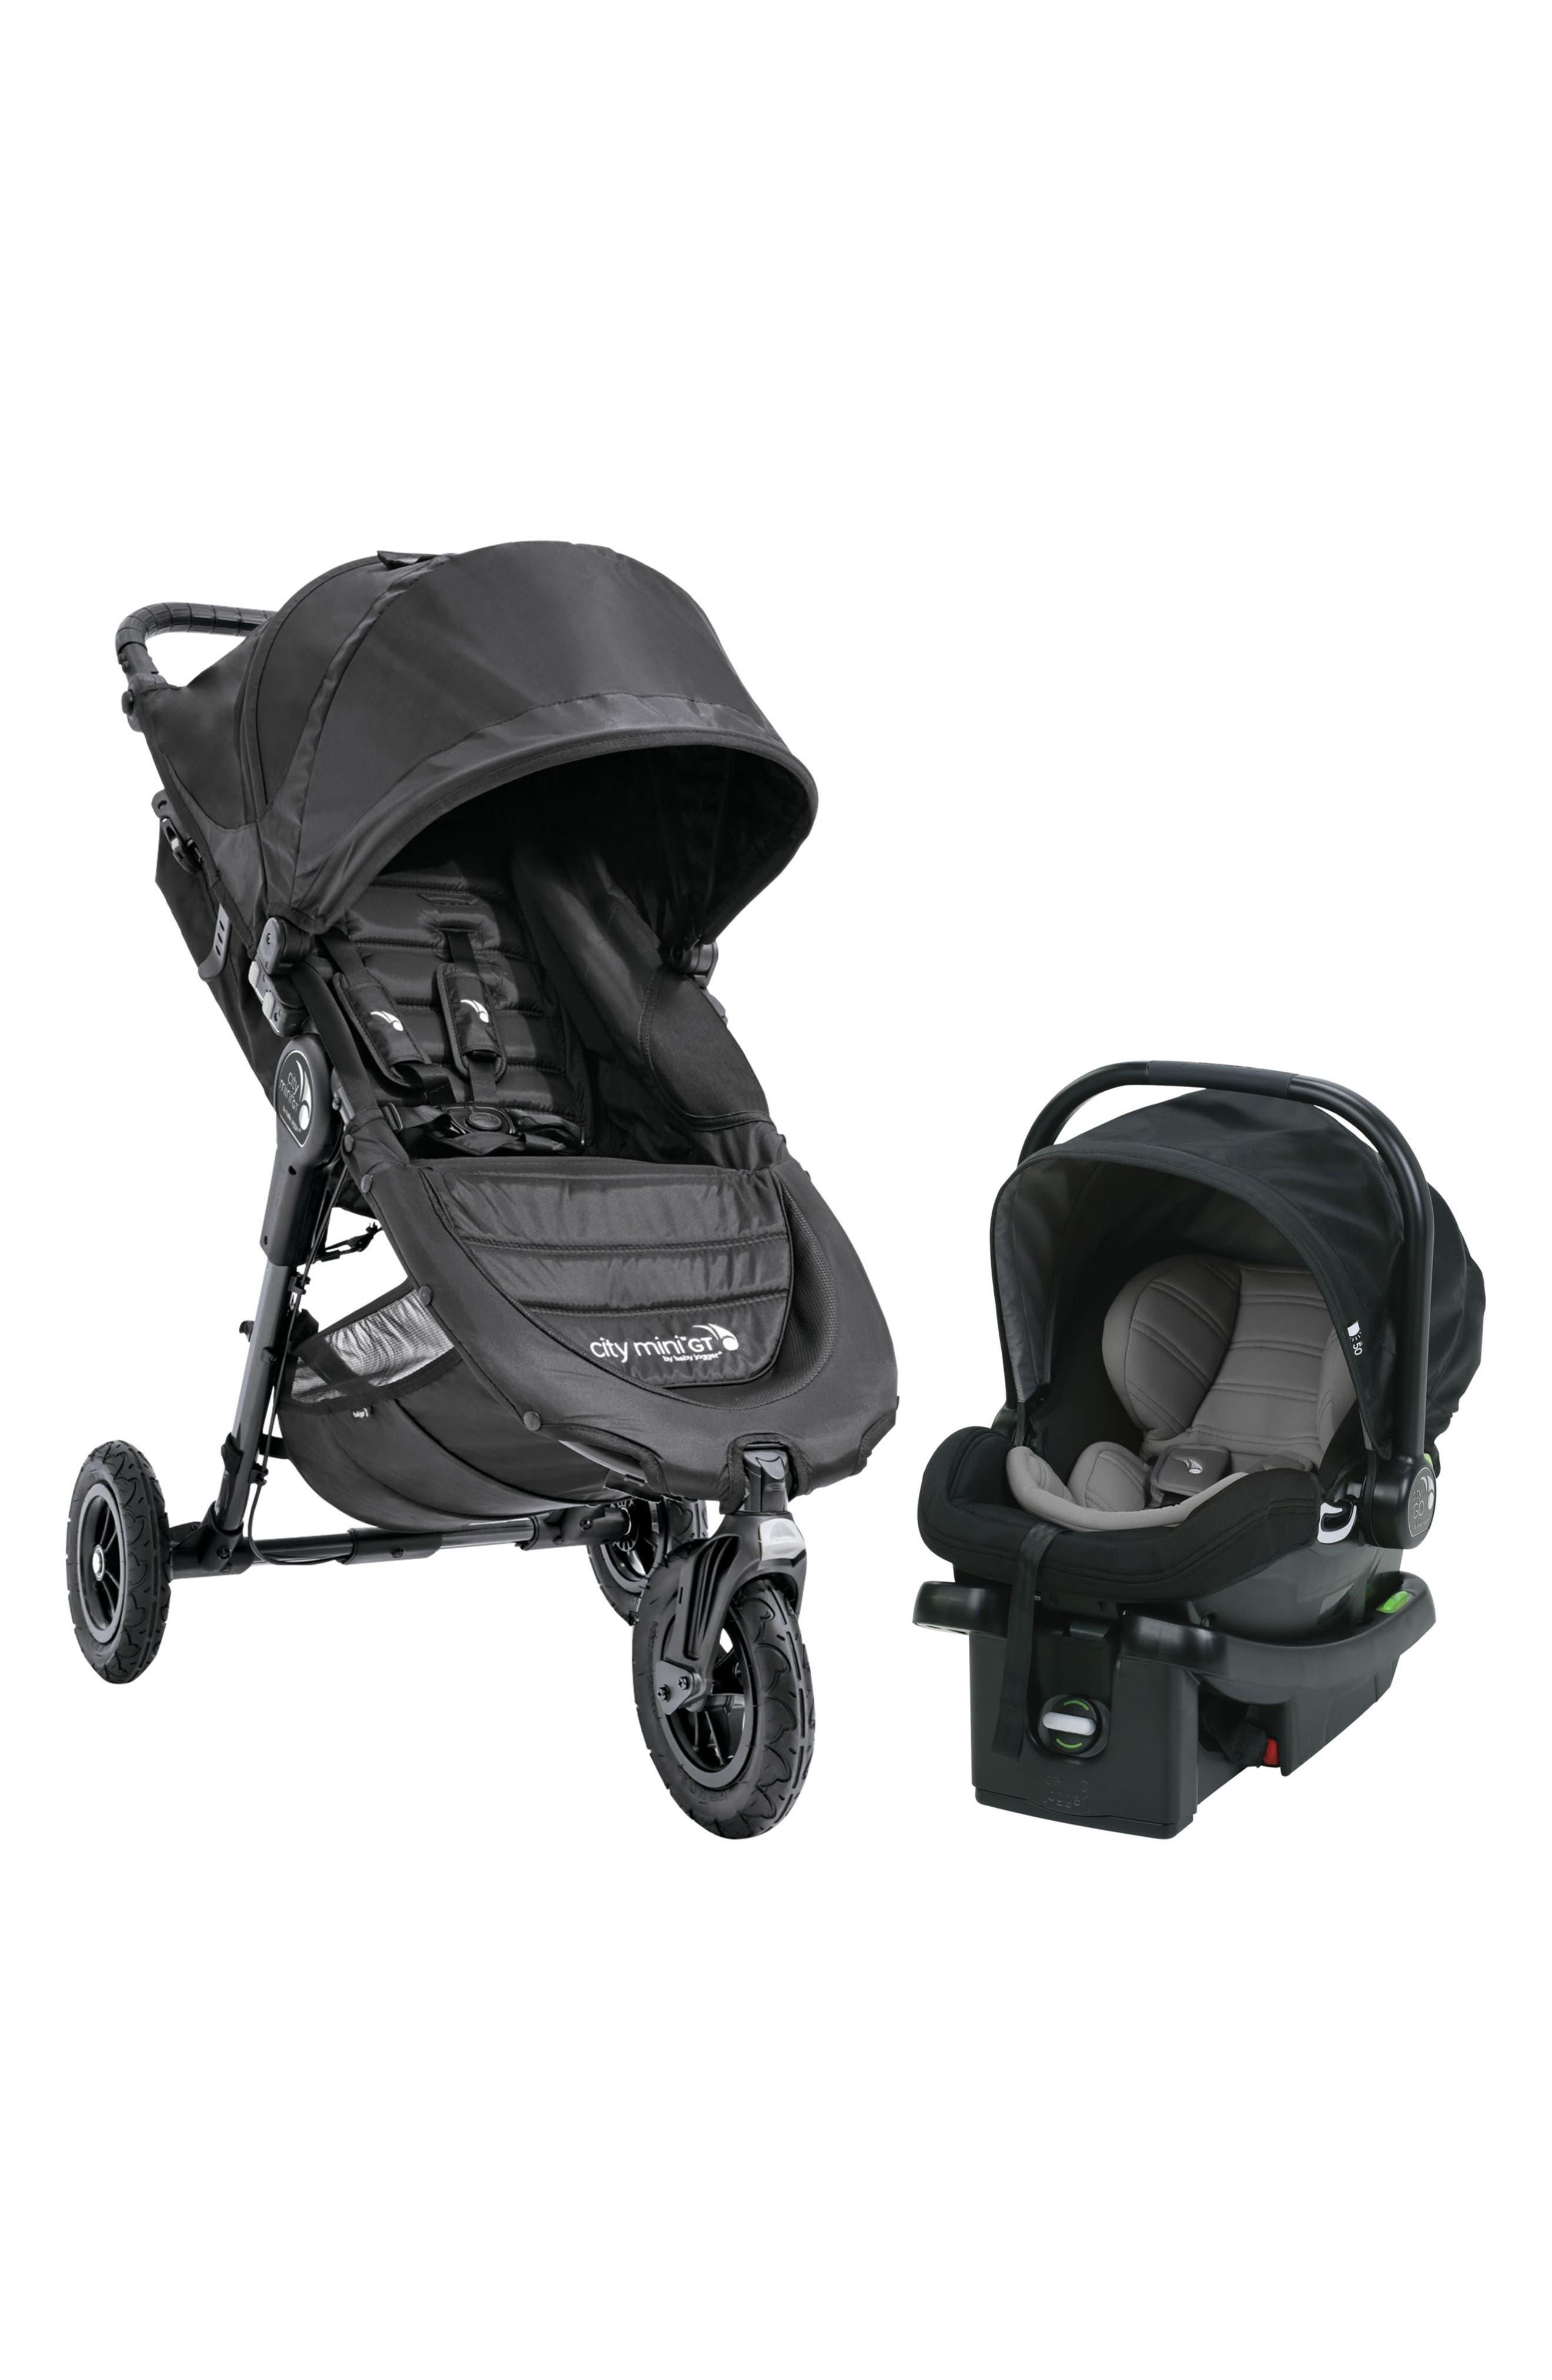 City Mini Single Stroller & City Go Infant Car Seat Travel System,                         Main,                         color, Black